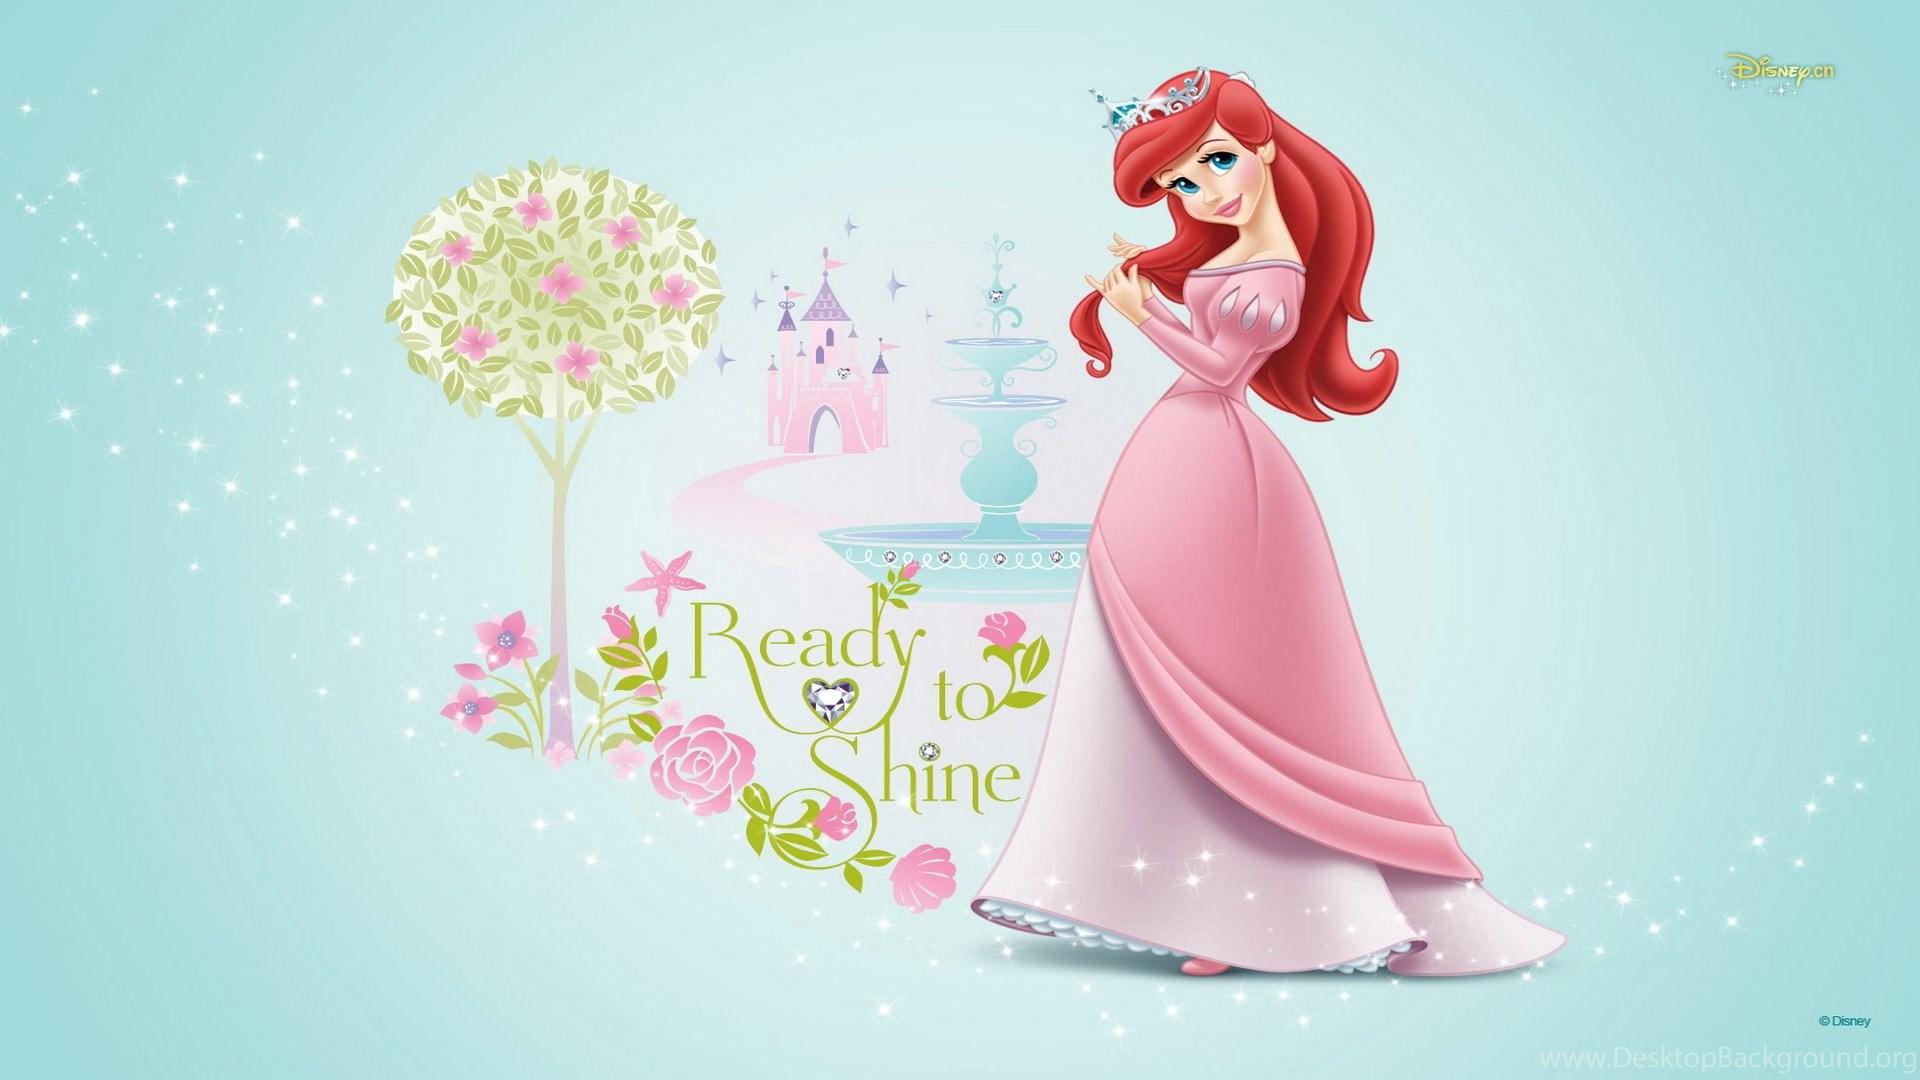 high resolution disney princess wallpapers hd 1080p full